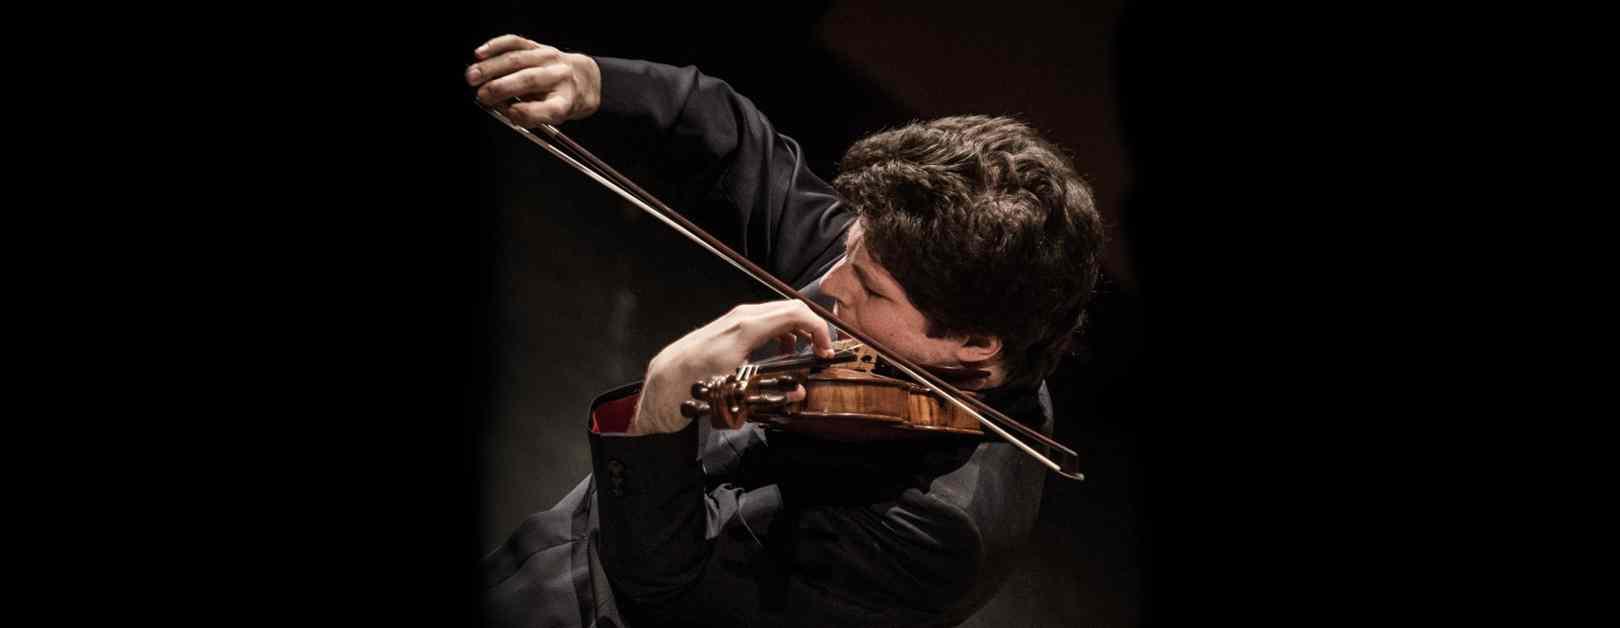 Dvořák's Violin Concerto